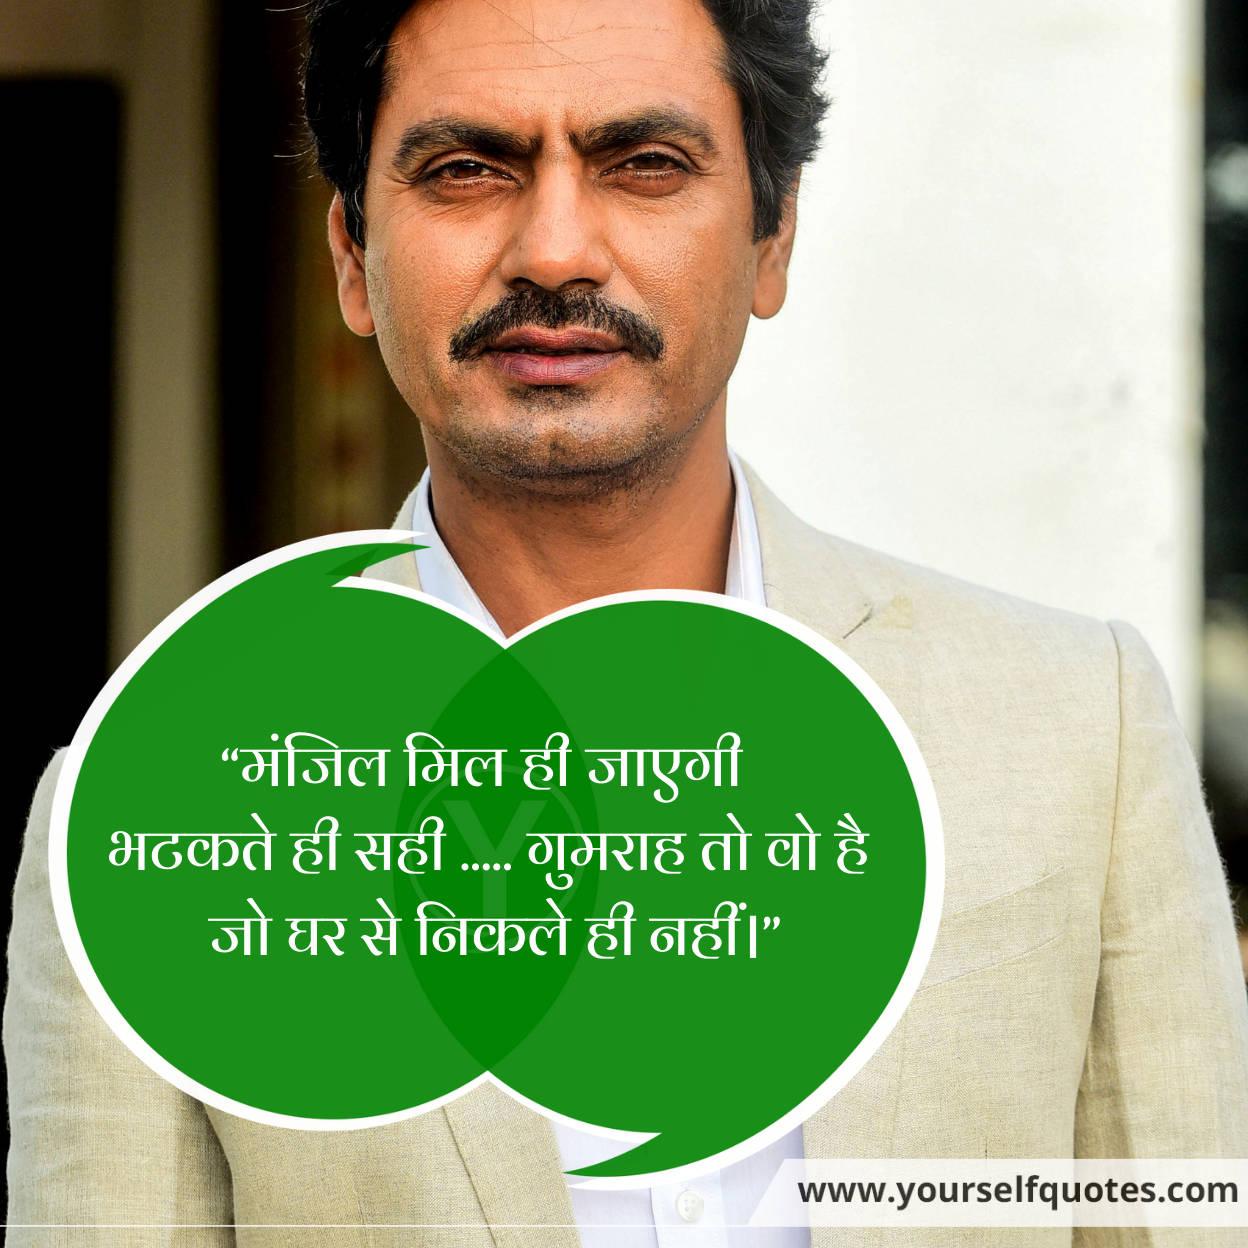 Hindi Quotes Images